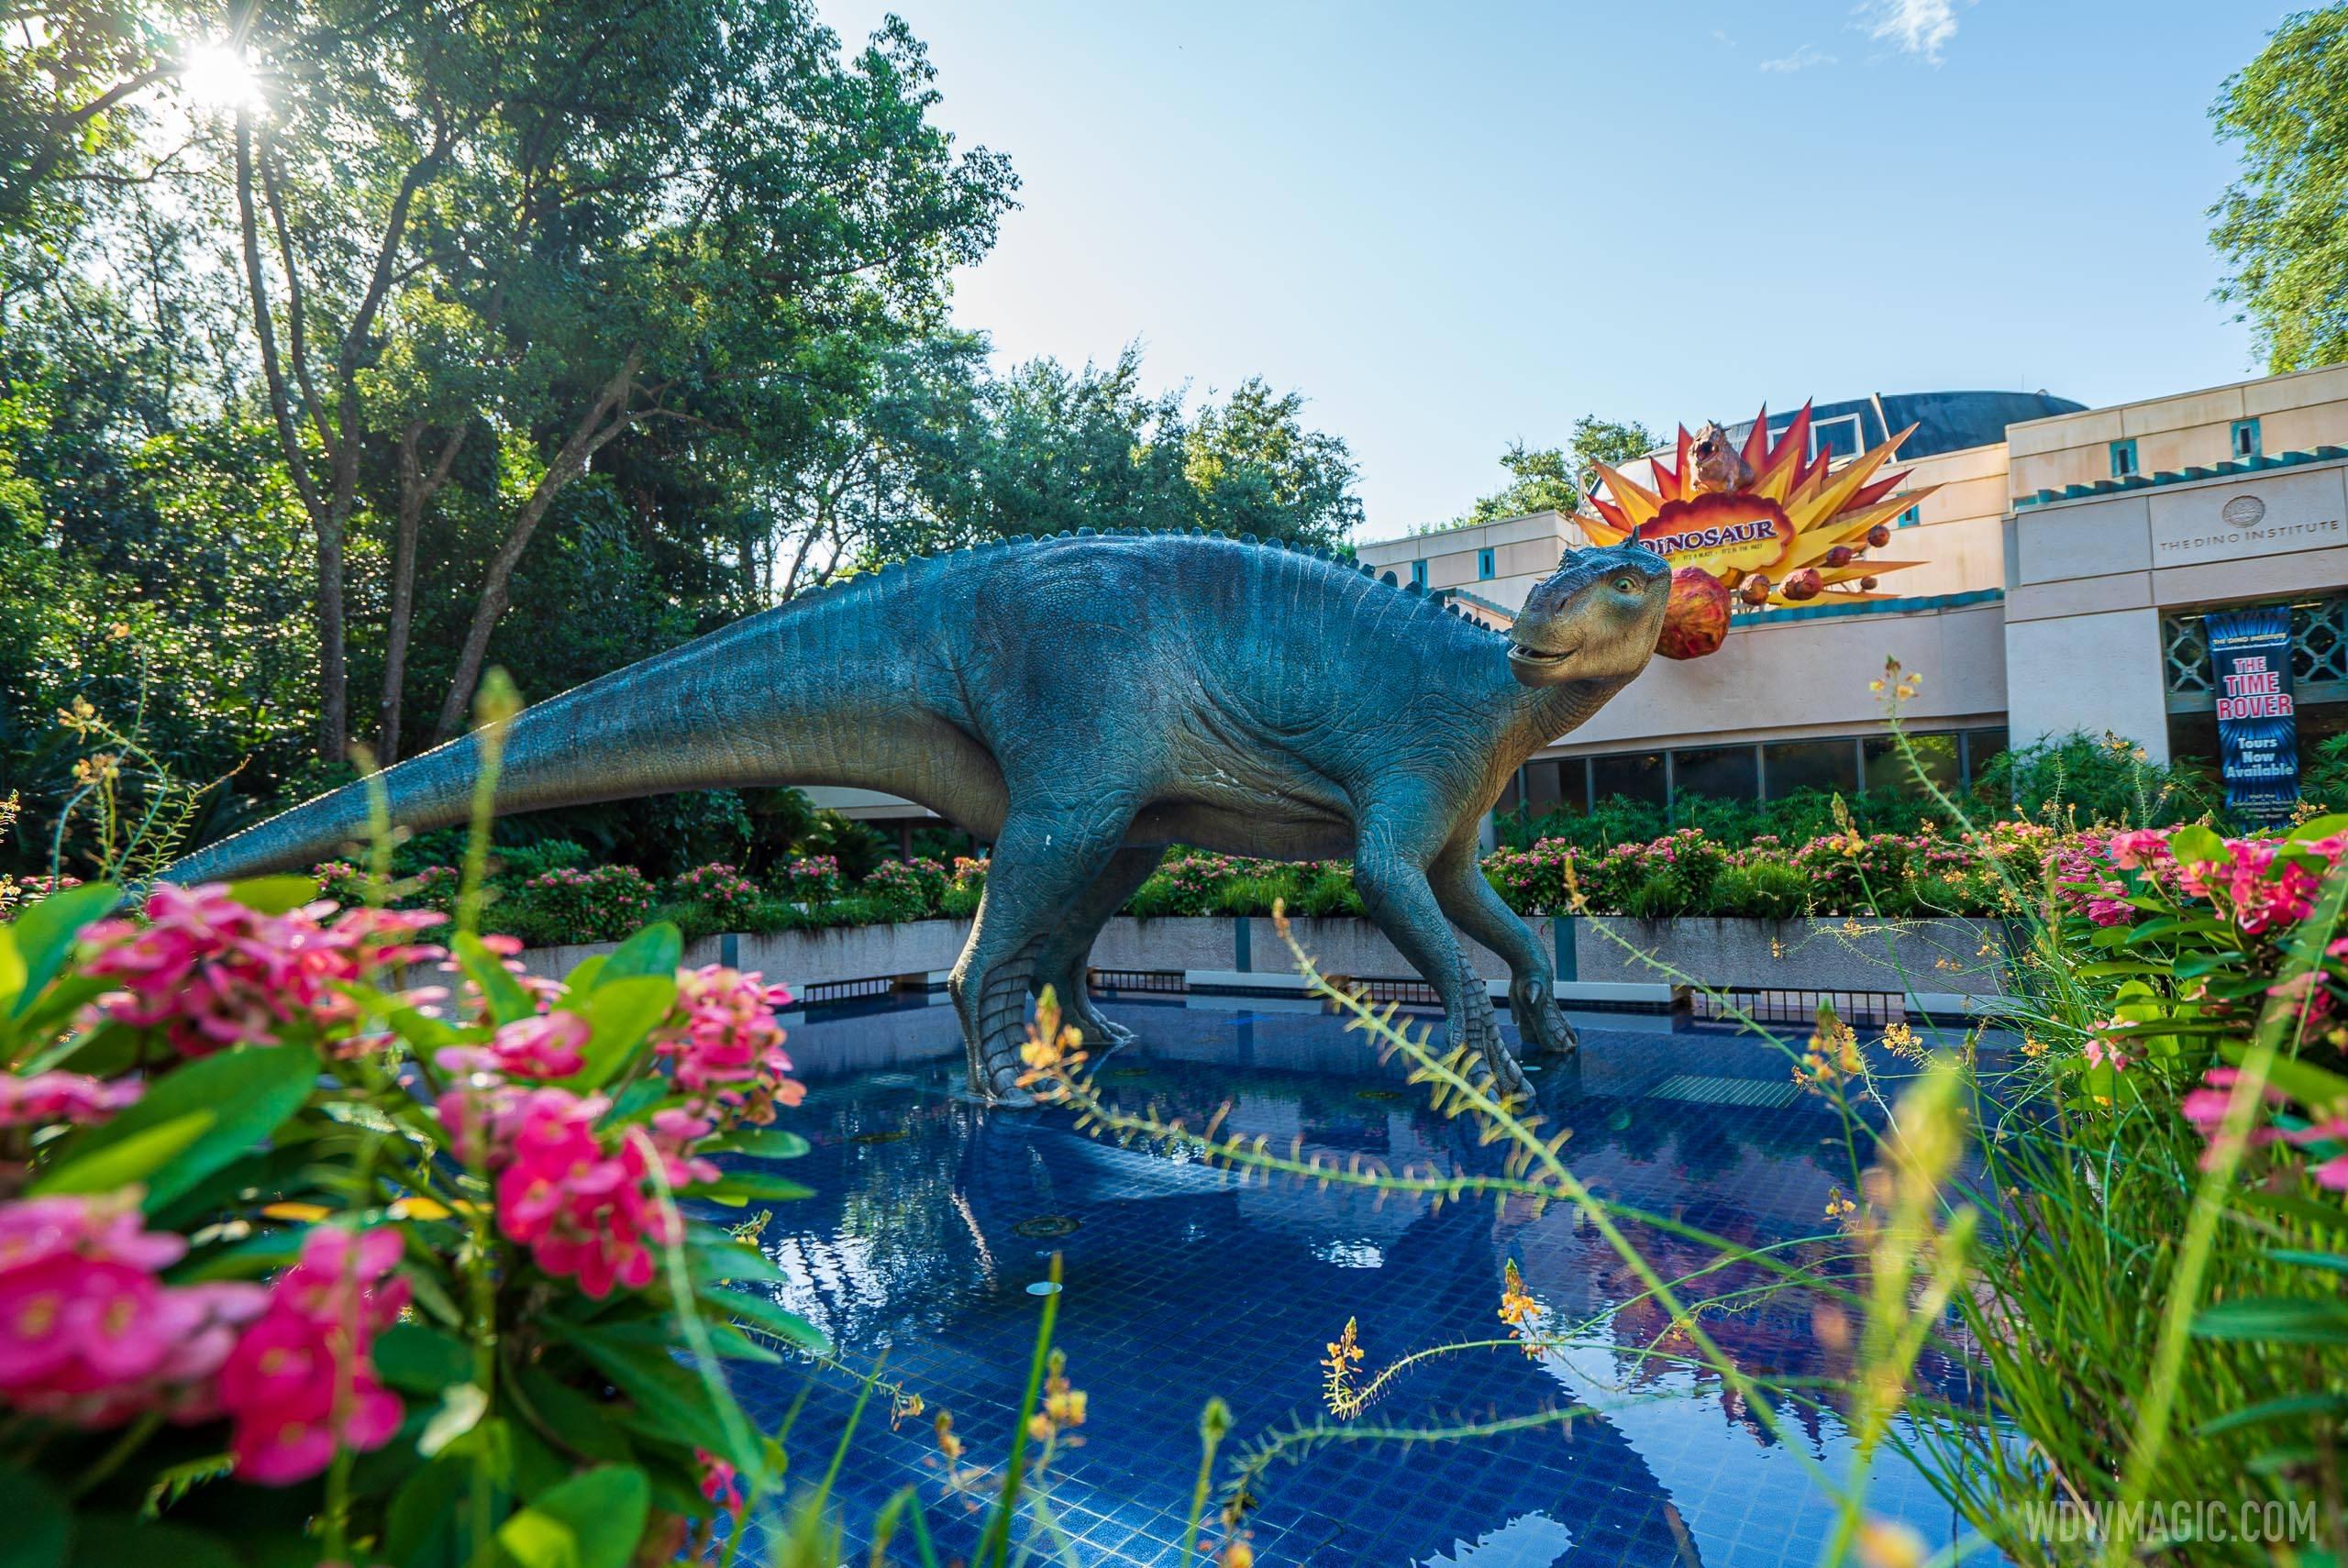 Dinosaur overview